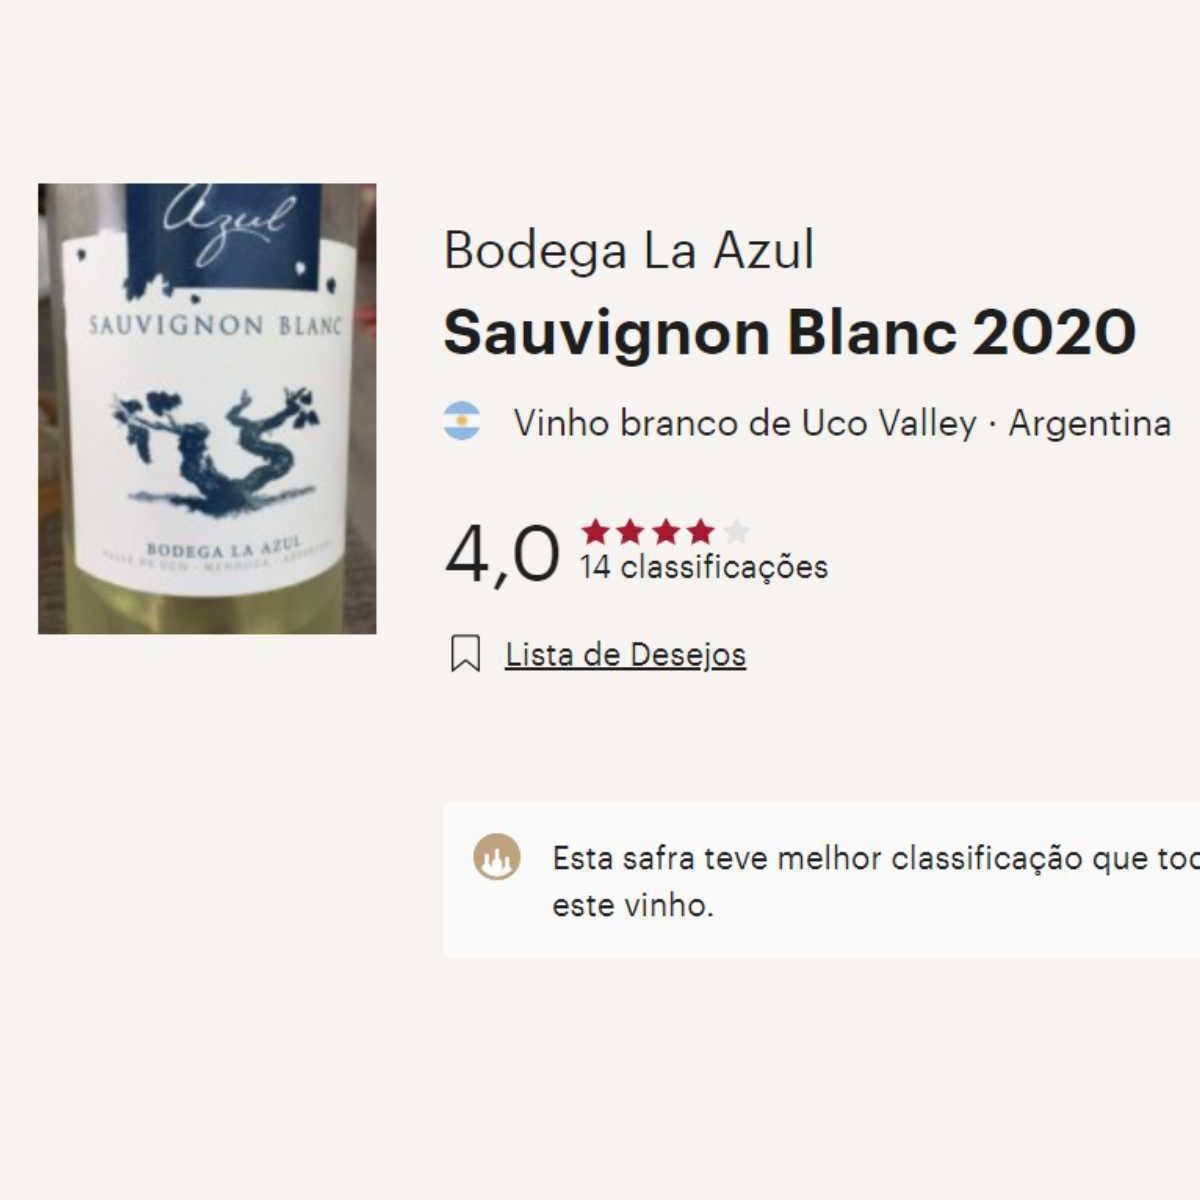 Caixa com 6 unidades de Sauvignon Blanc 2020